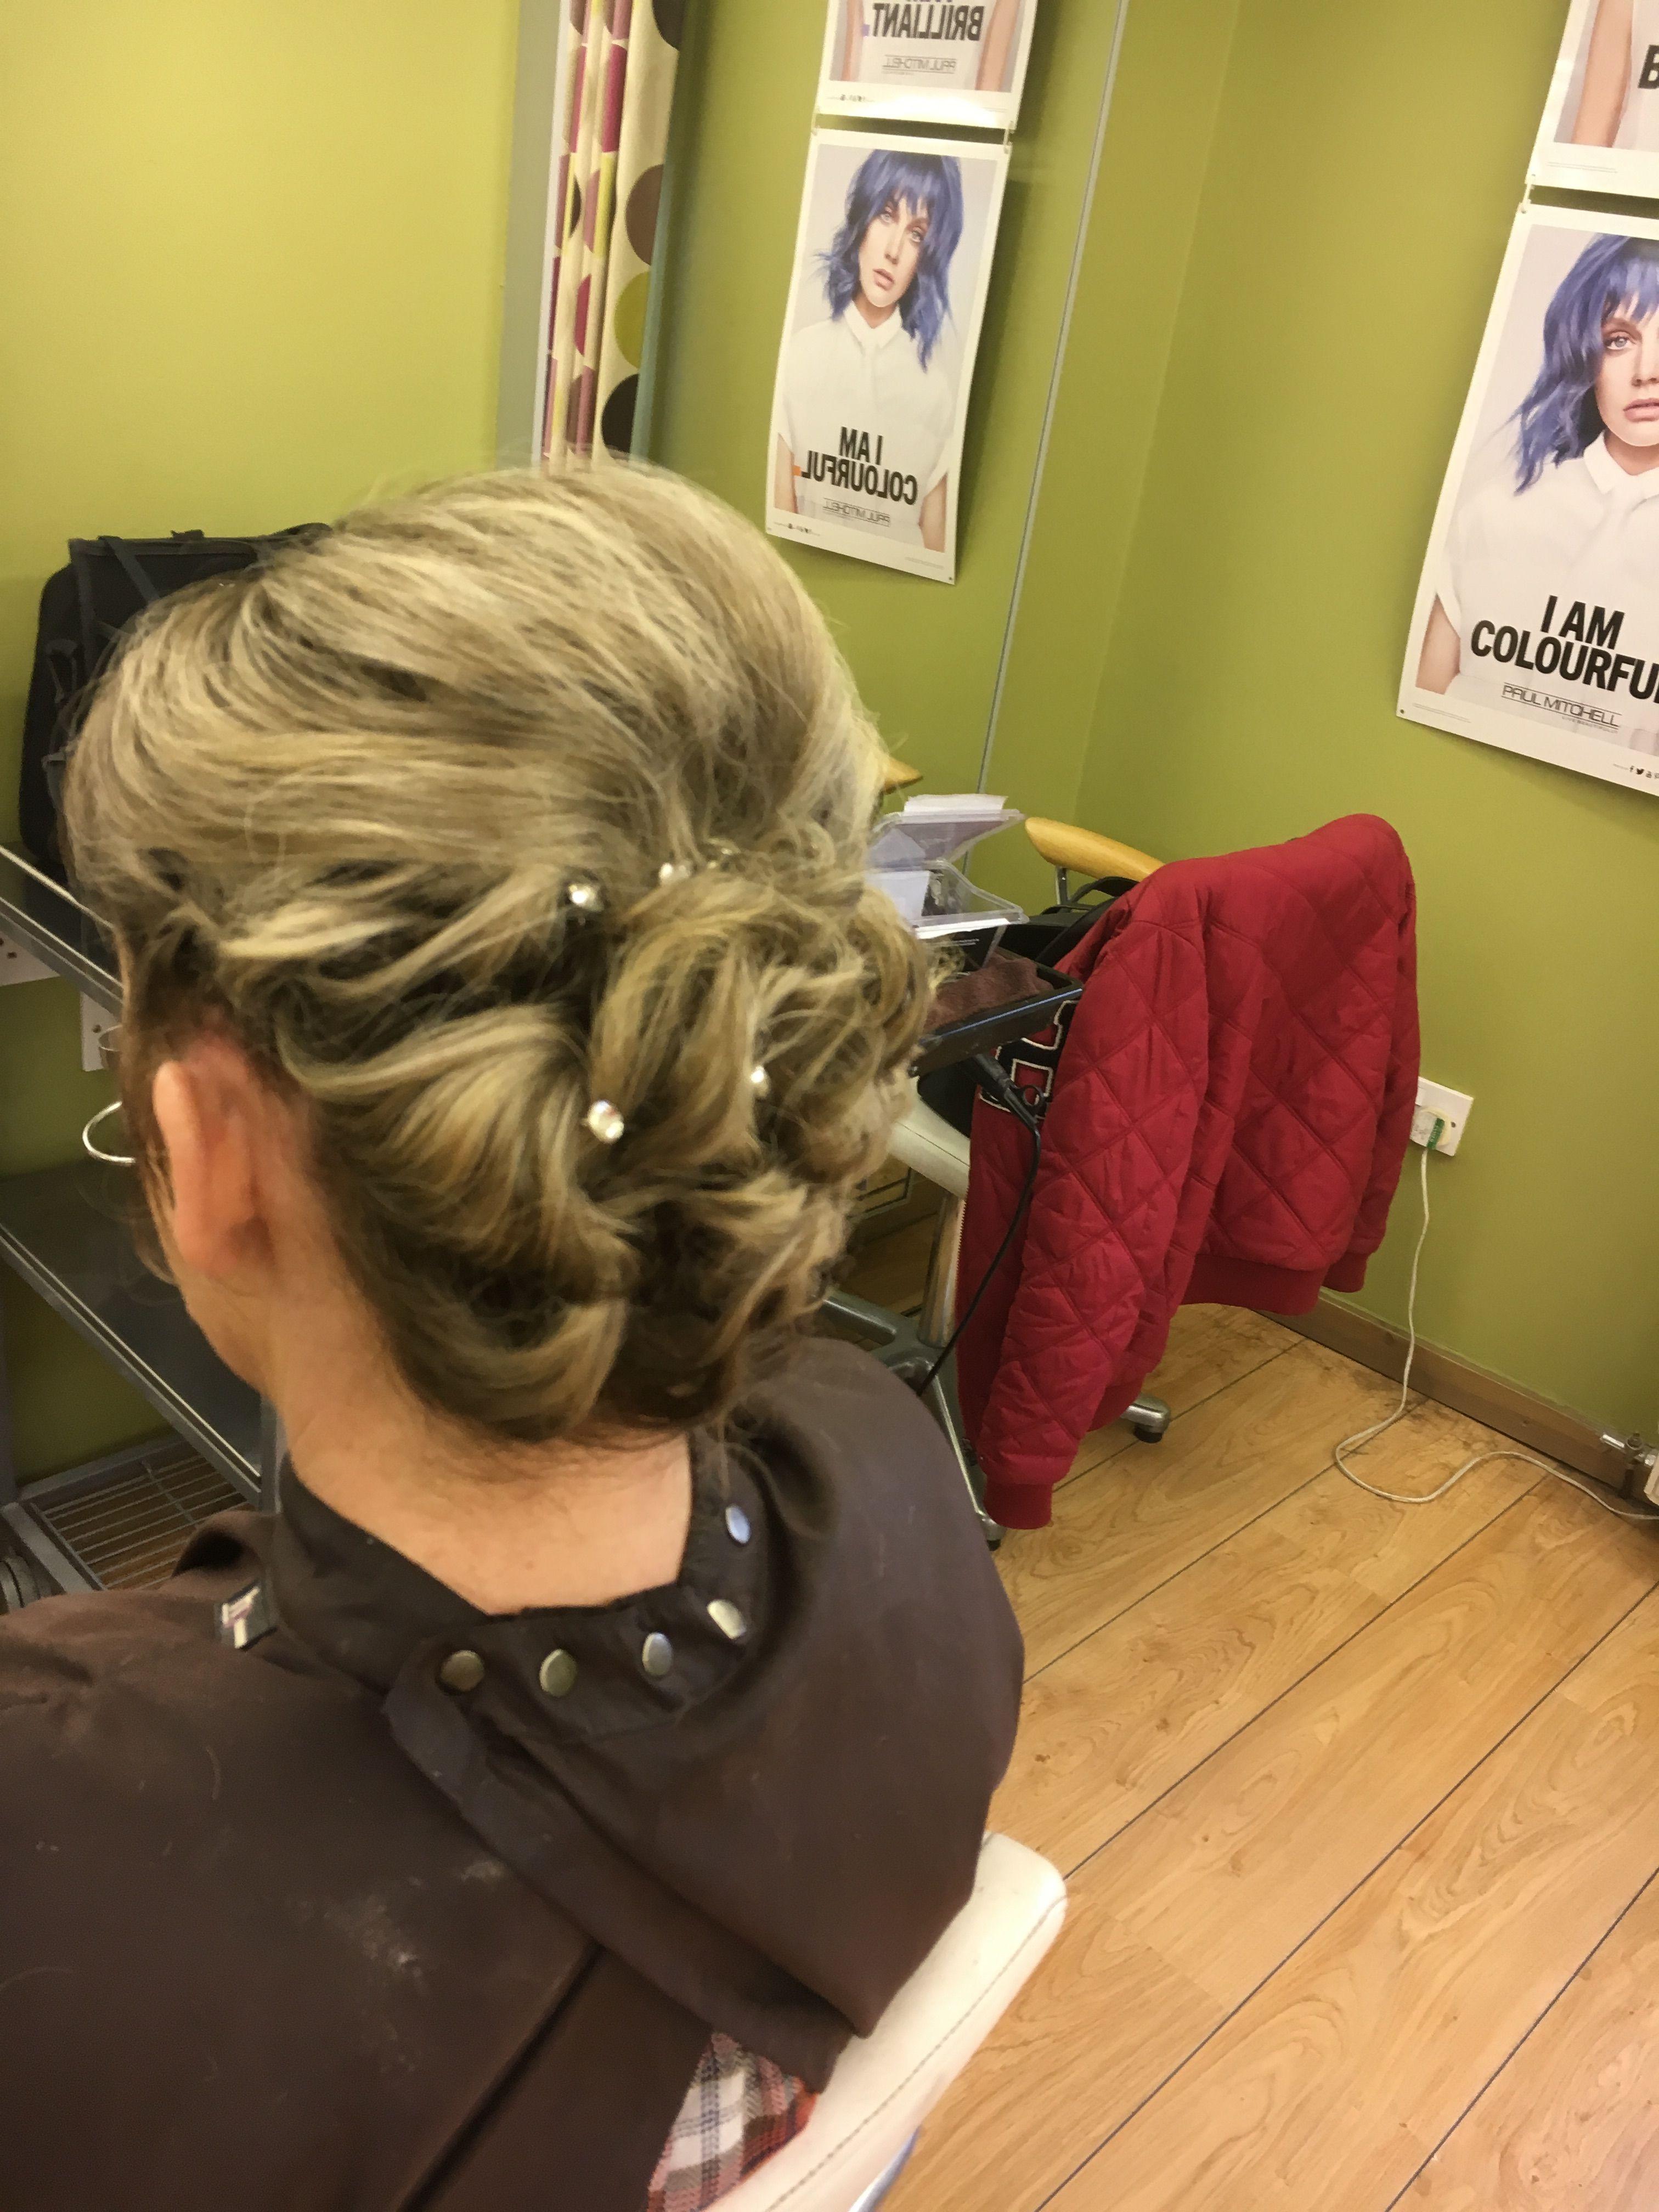 Pin by joanne morris on hair up u colour board pinterest